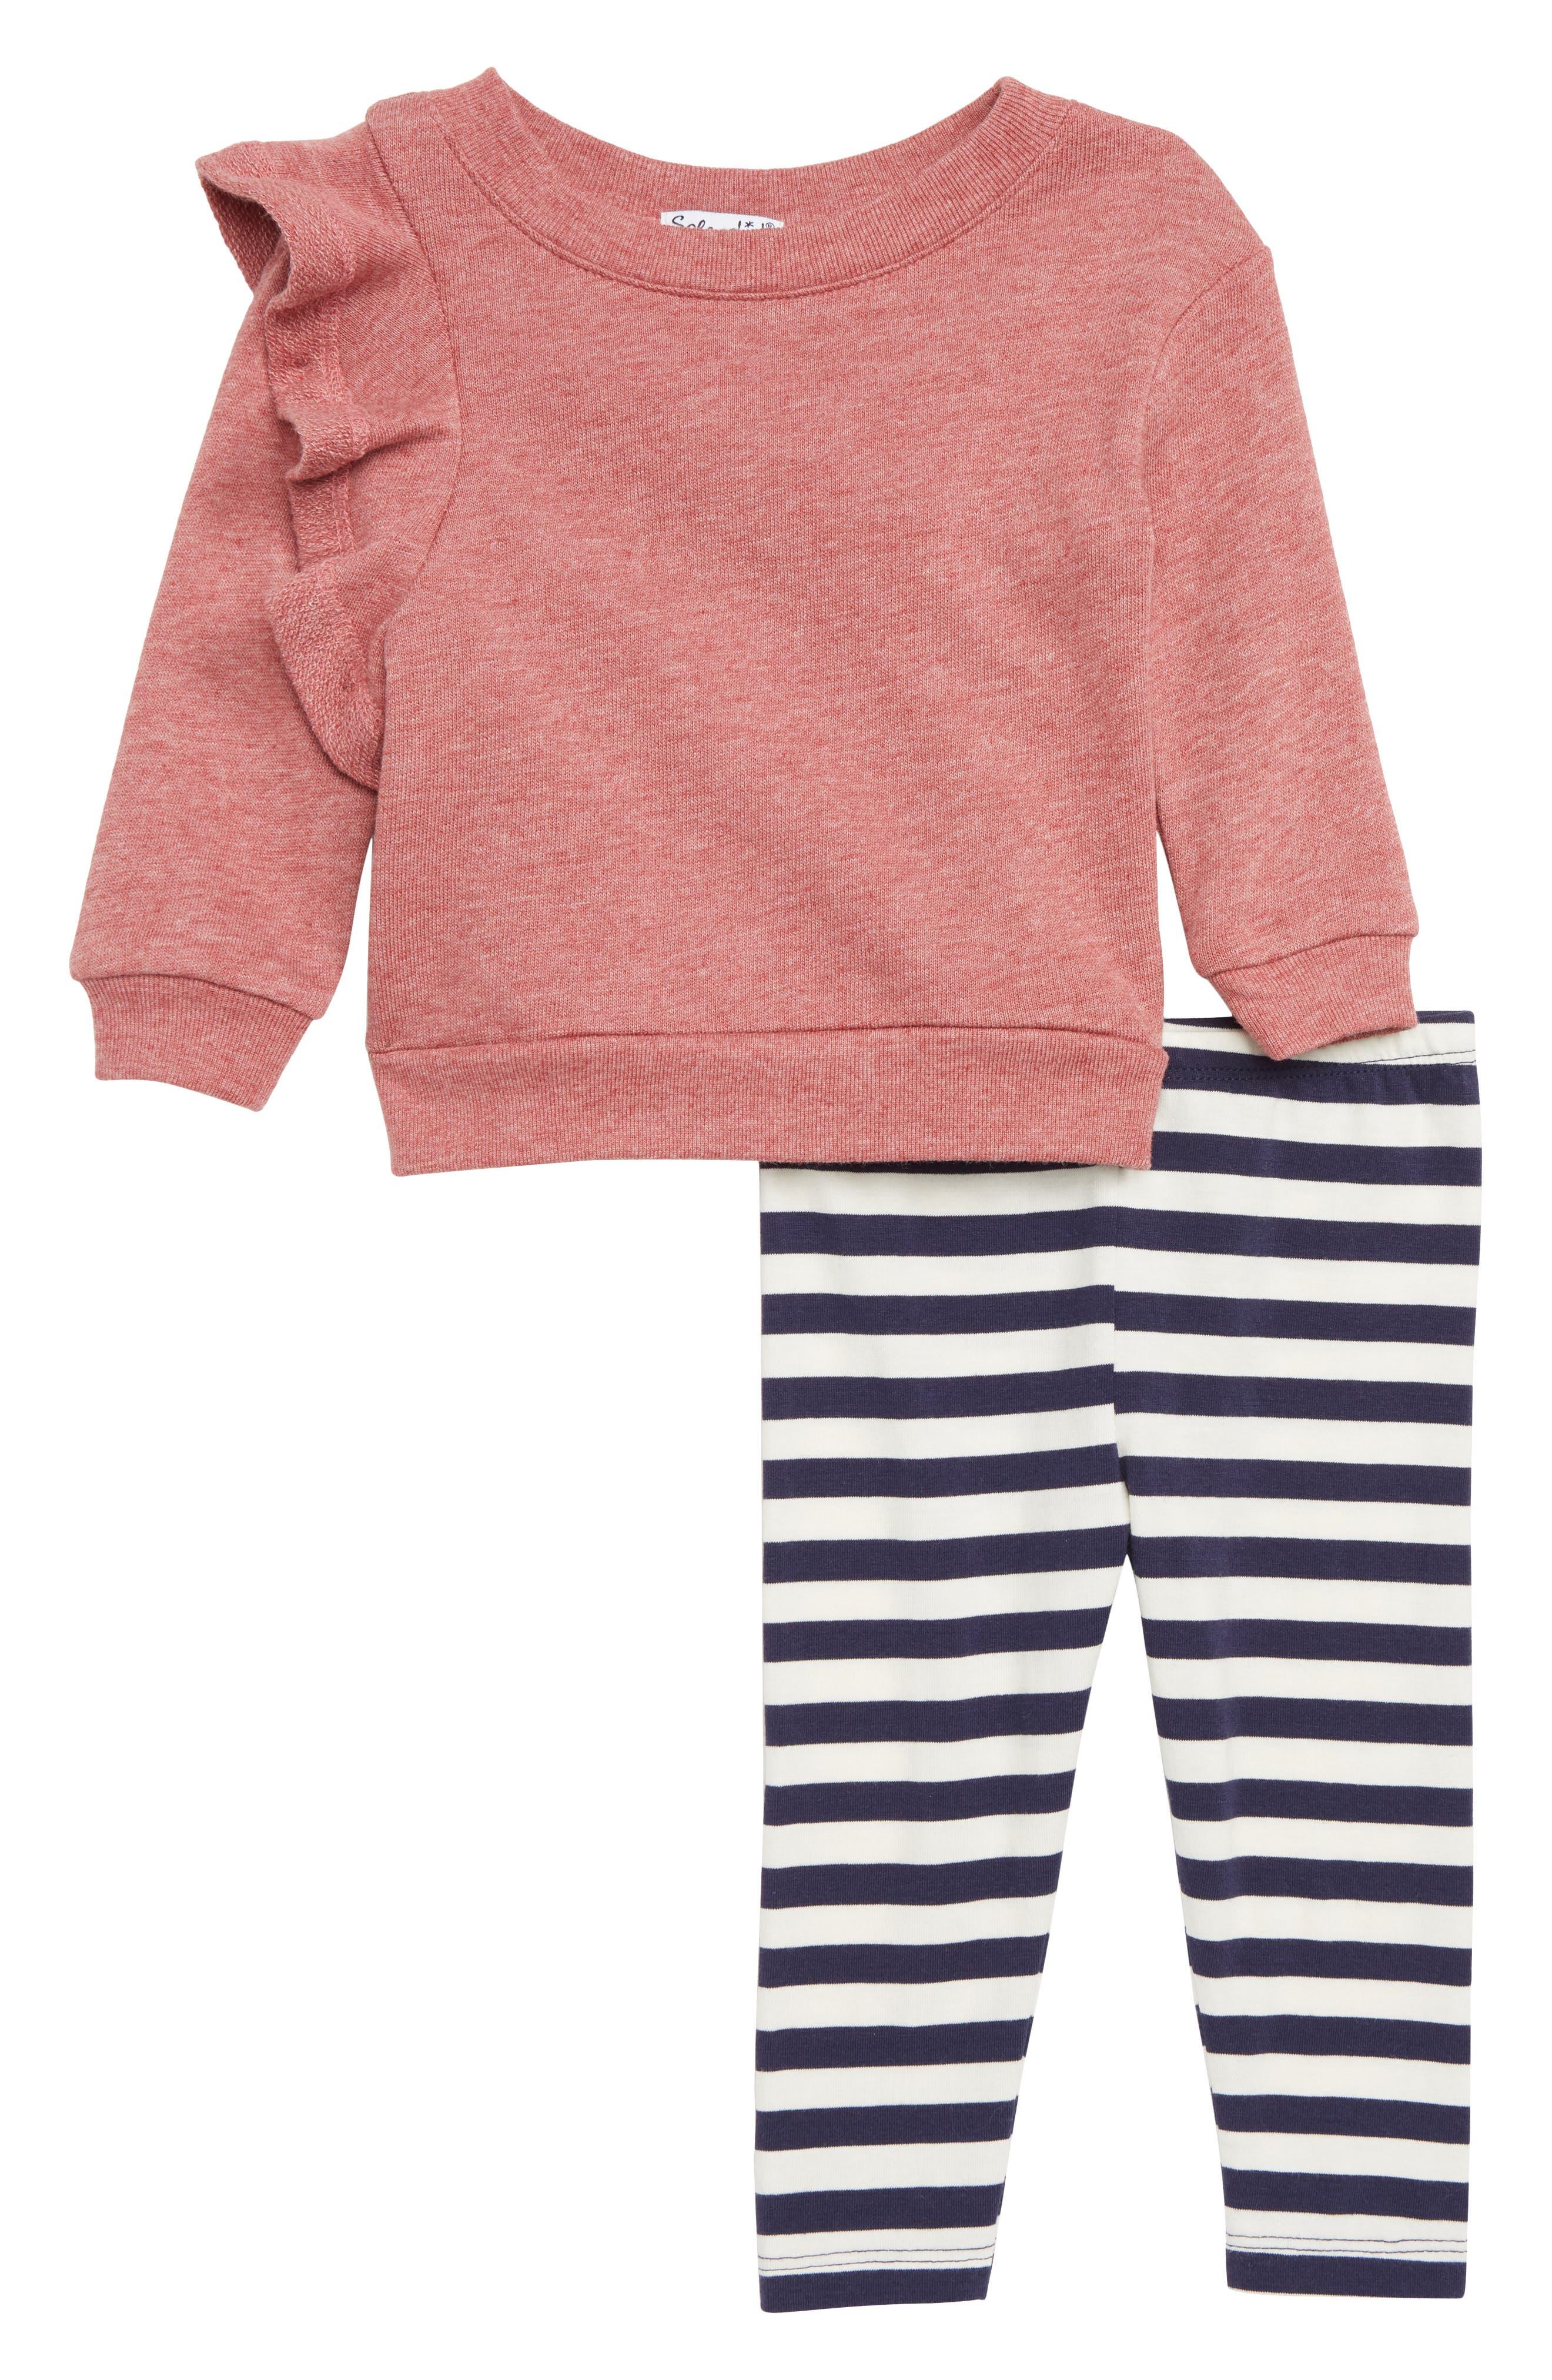 SPLENDID, Ruffle Sweatshirt & Stripe Leggings Set, Main thumbnail 1, color, 650